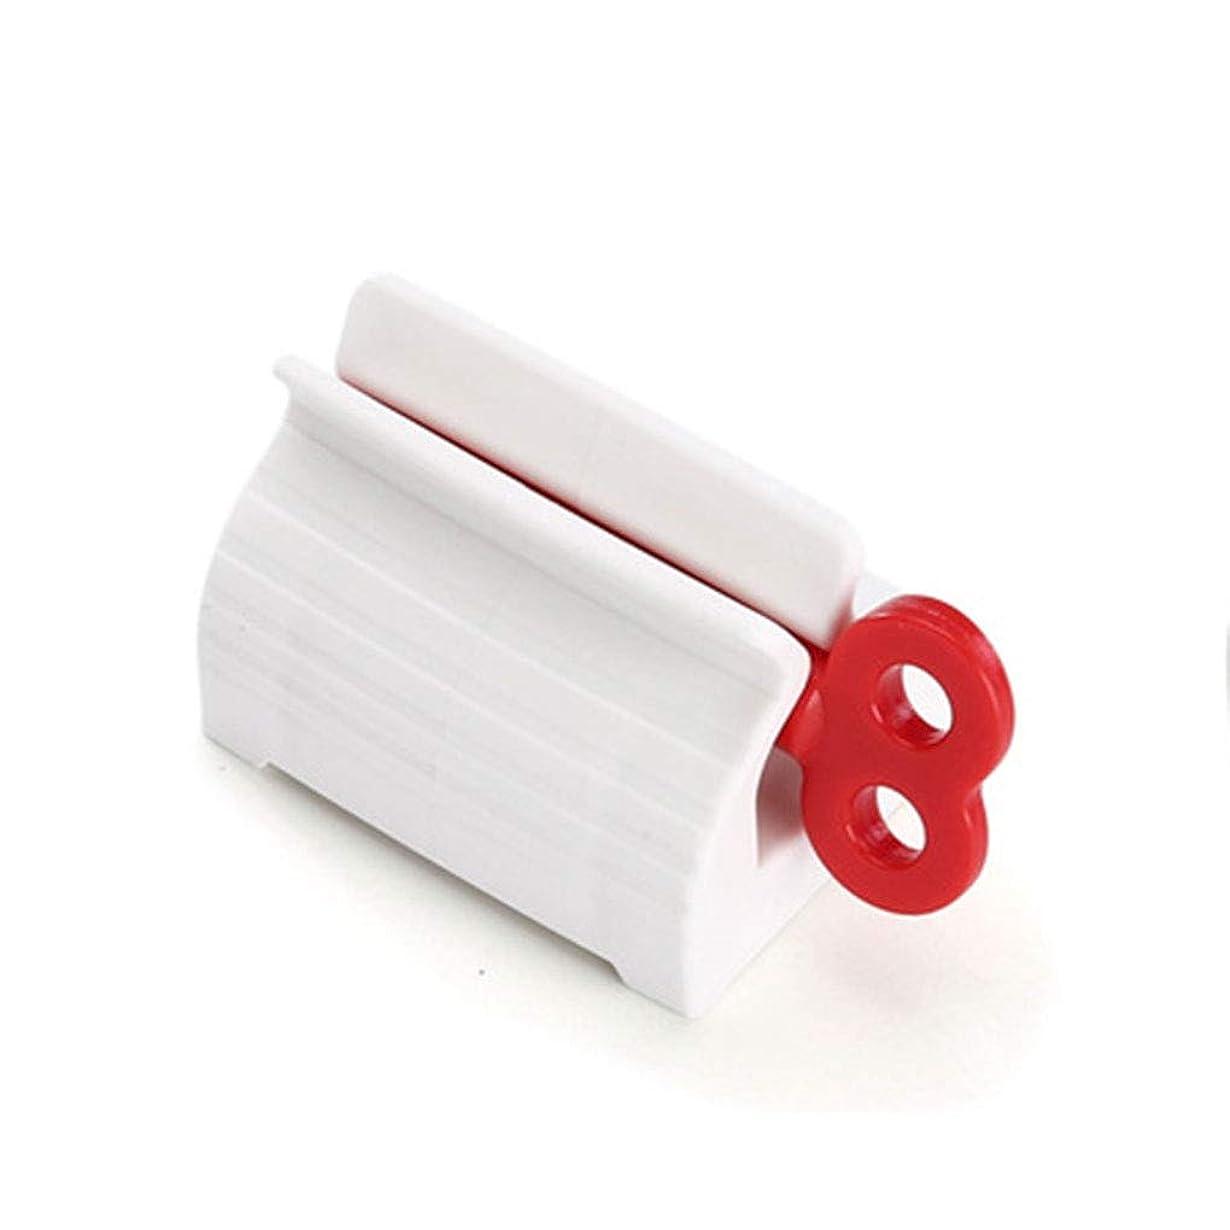 KOROWAチューブ絞り器 軟膏押出器 ハンドクリーム 歯磨き粉チューブスクイーザー